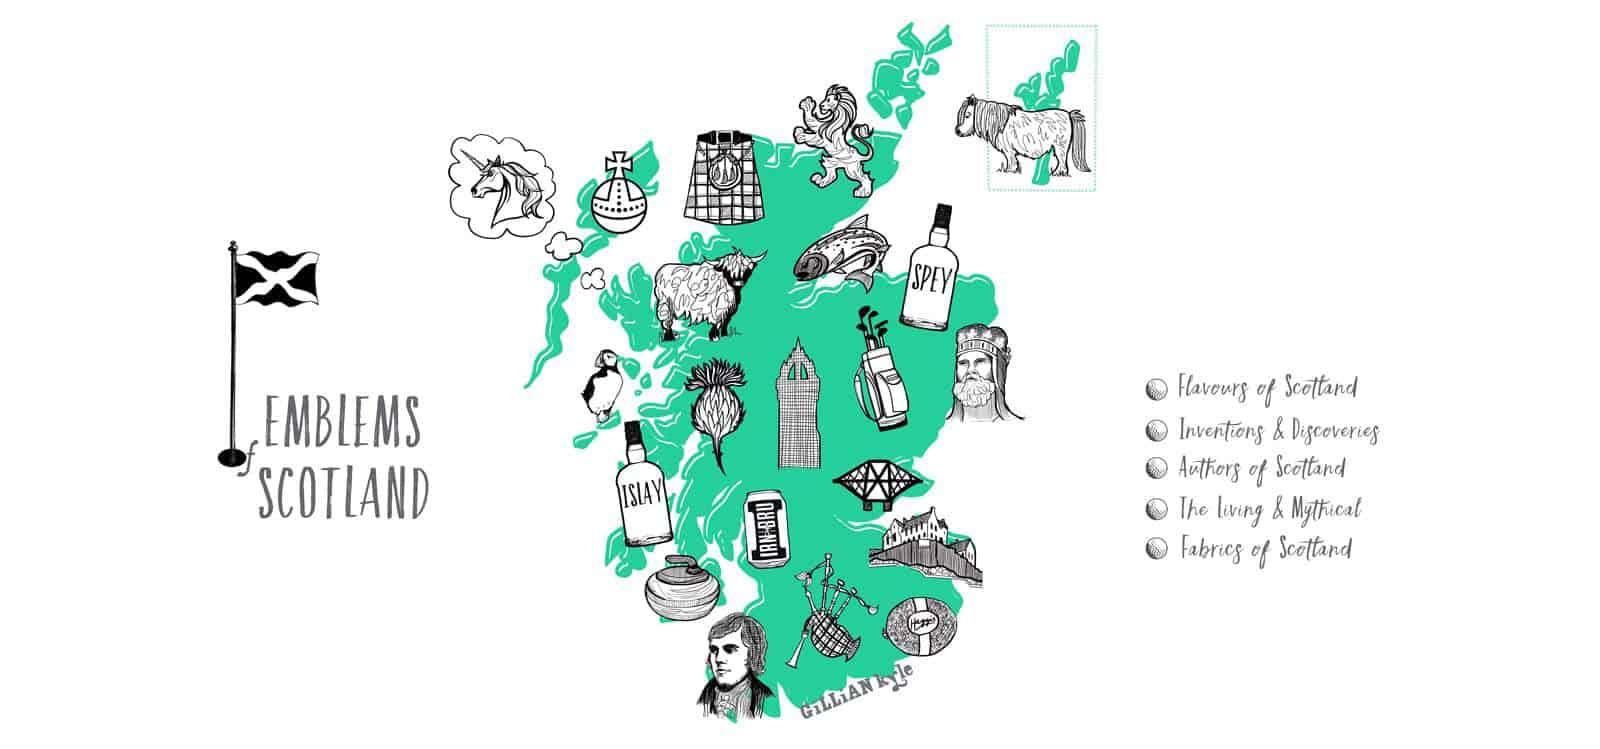 Emblems of Scotland by Scottish Artist Gillian Kyle